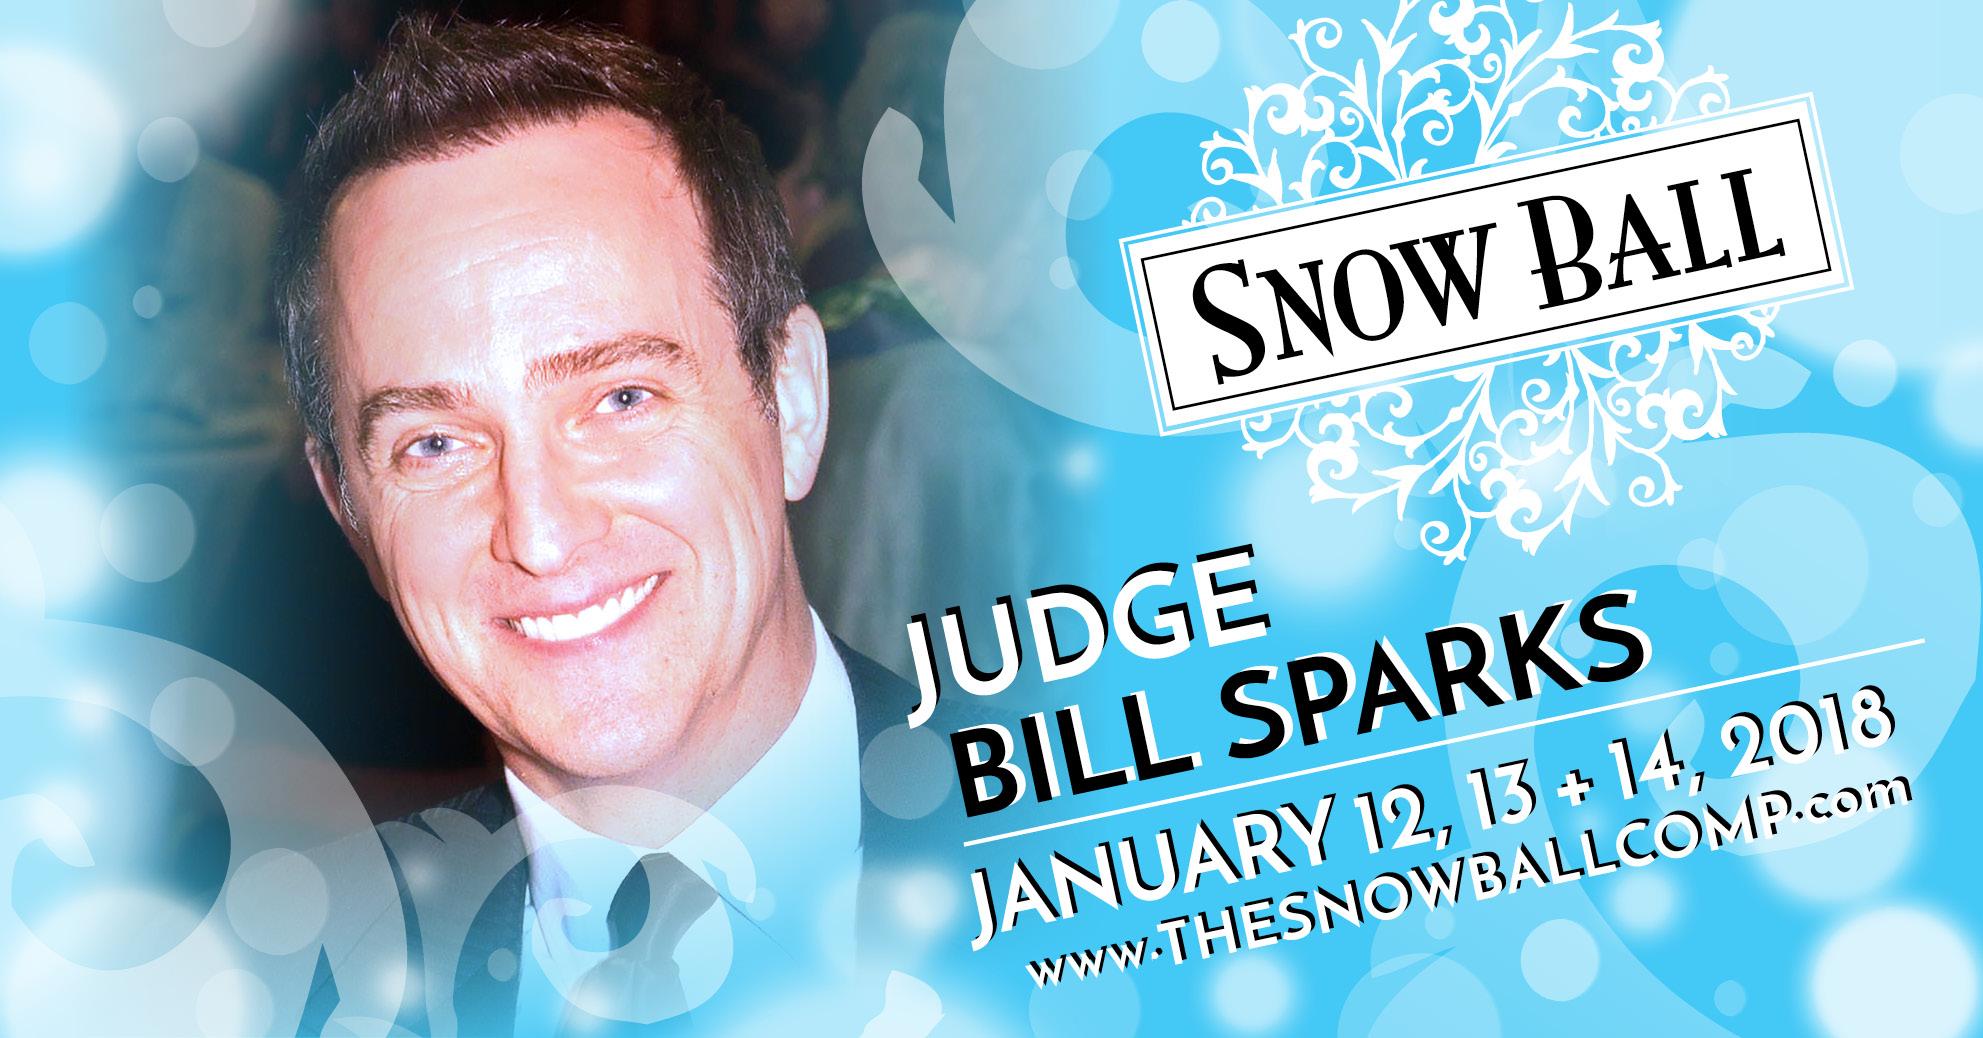 Sparks Bill_Judge2018_w.jpg